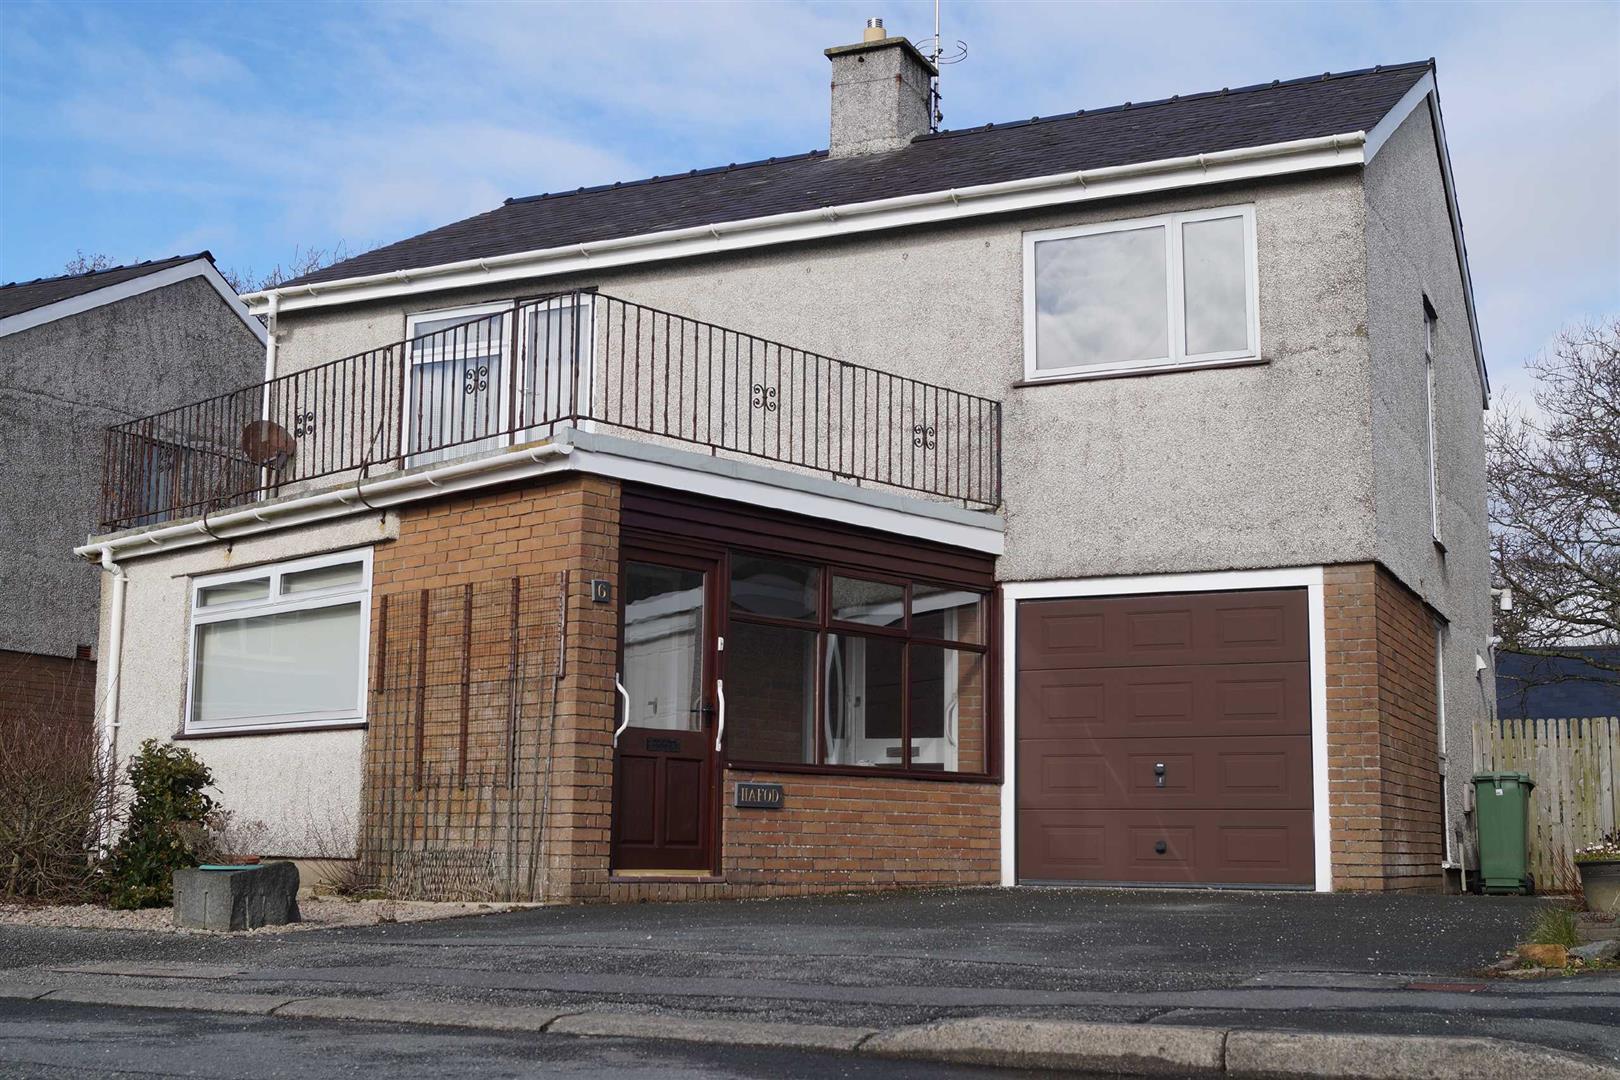 Lon Ceredigion, Pwllheli - £199,000/Reduced to